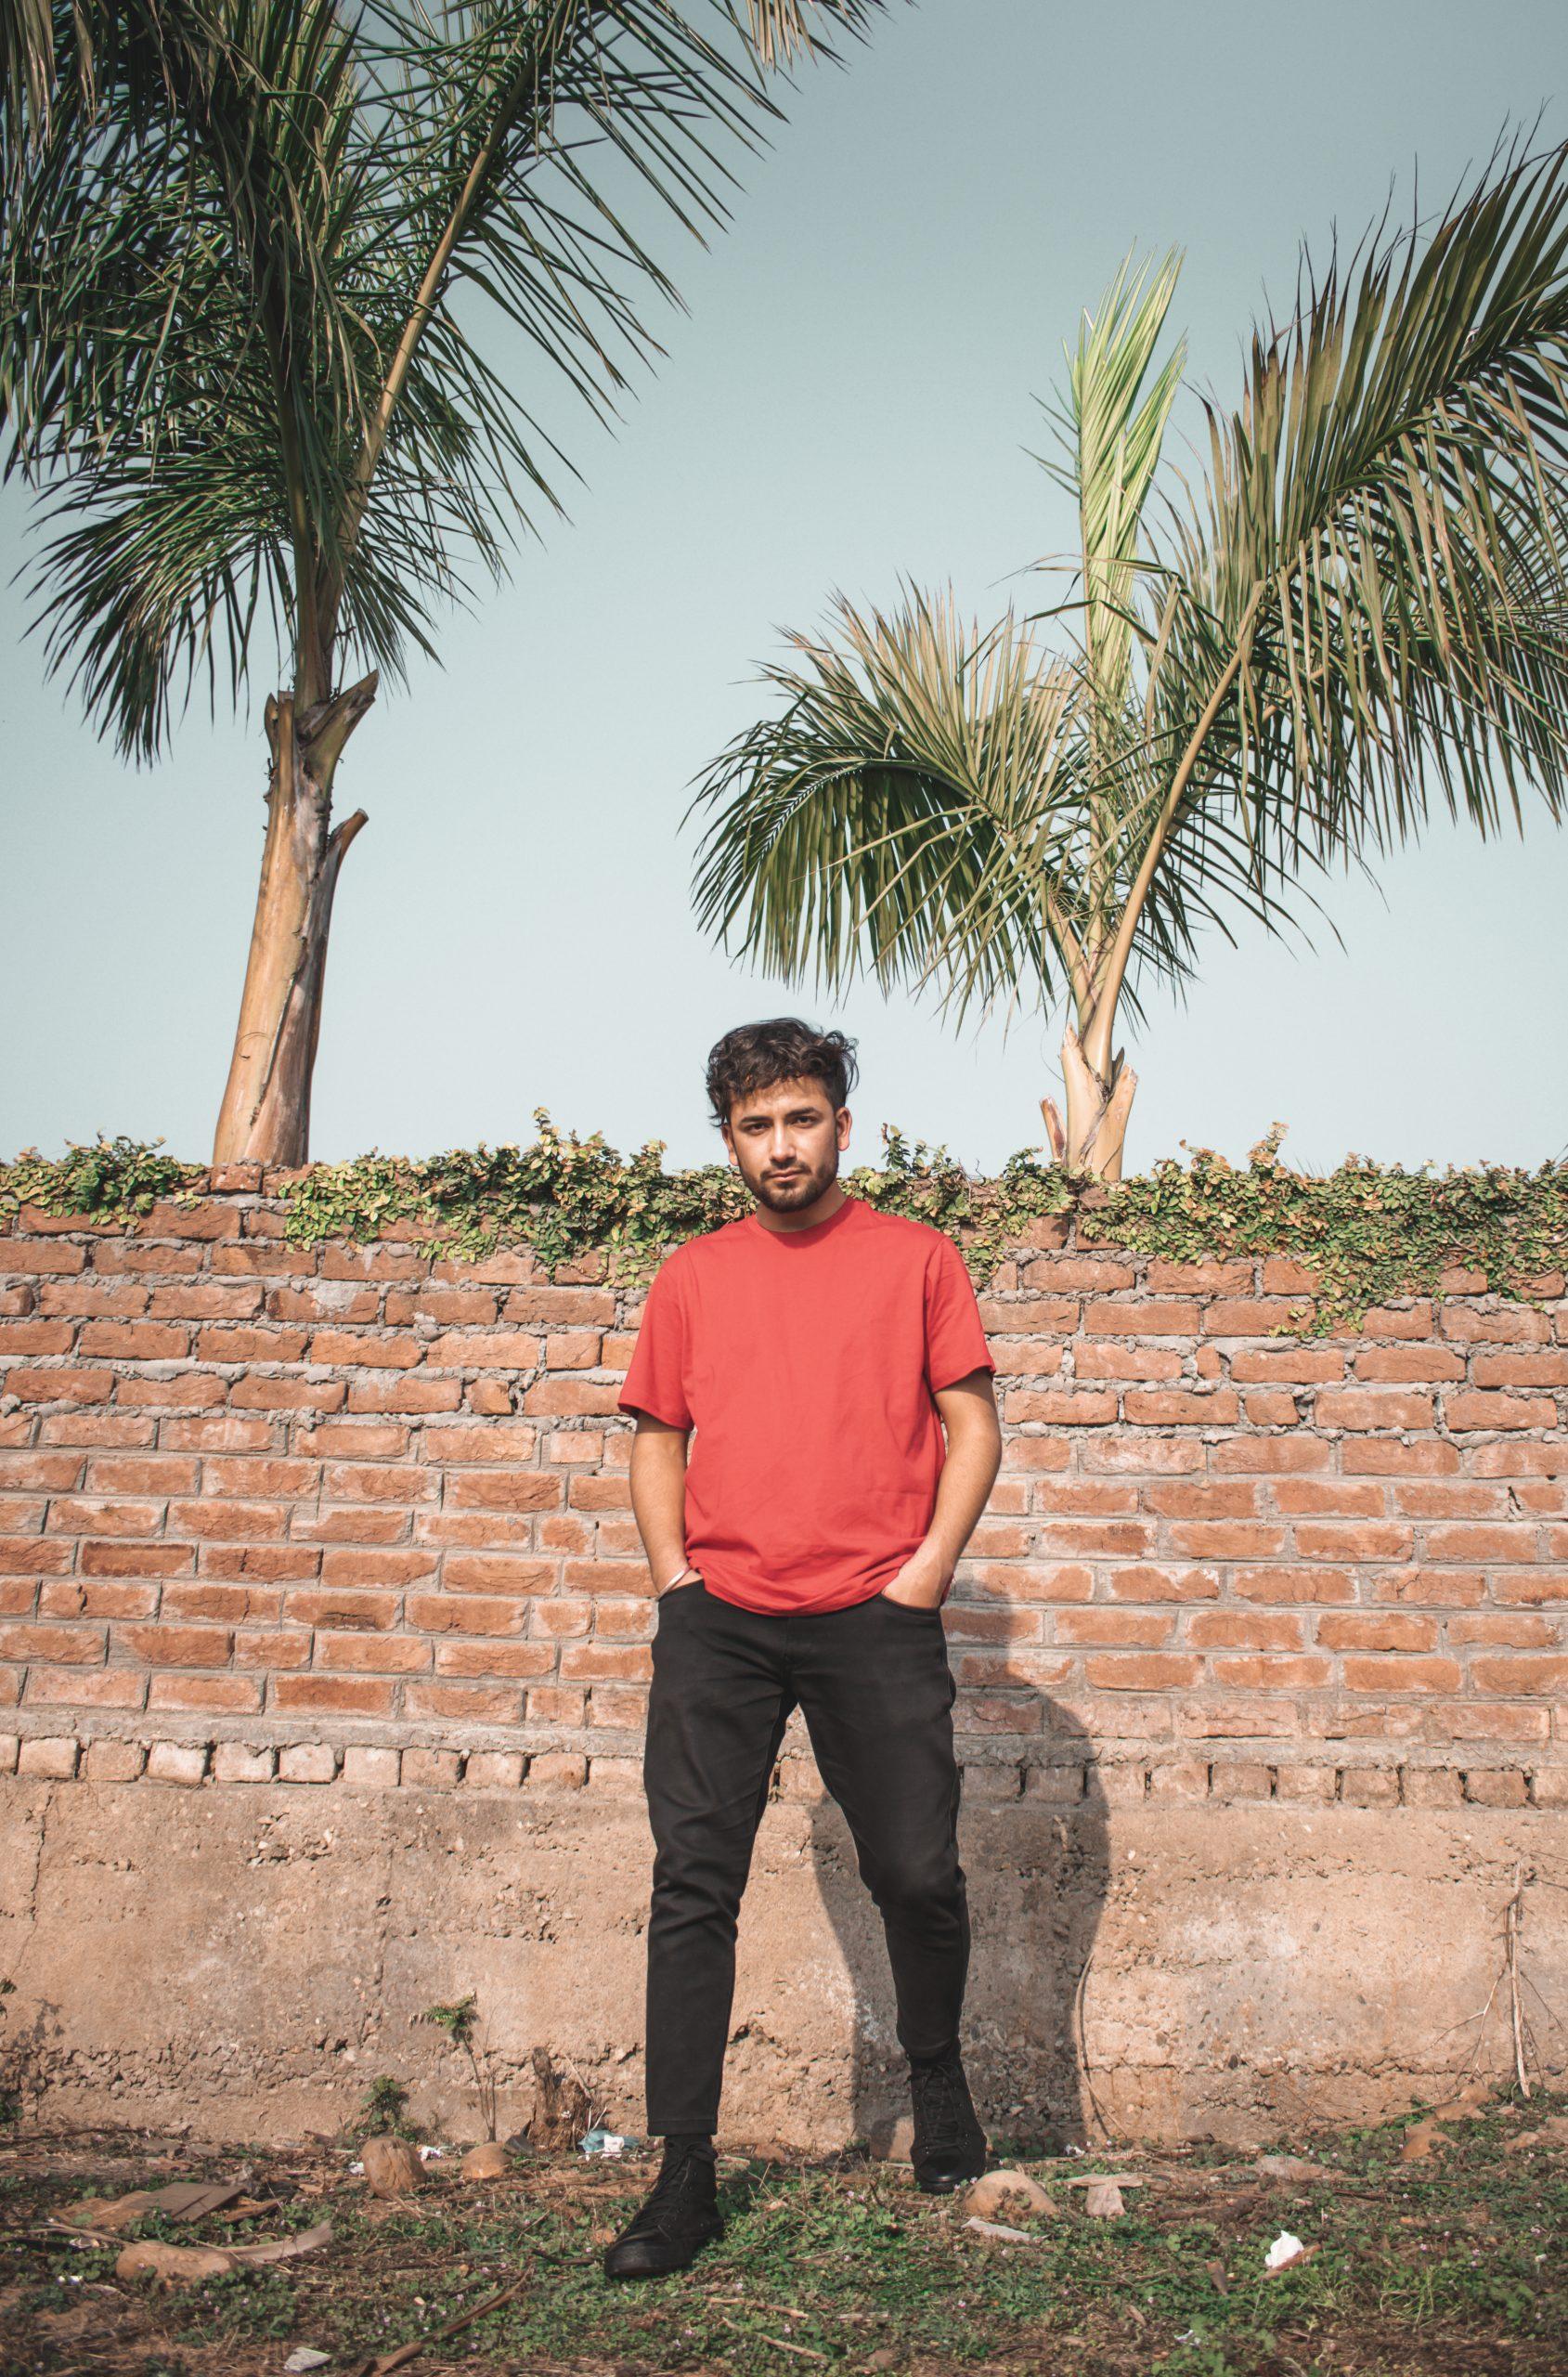 A boy posing against the wall